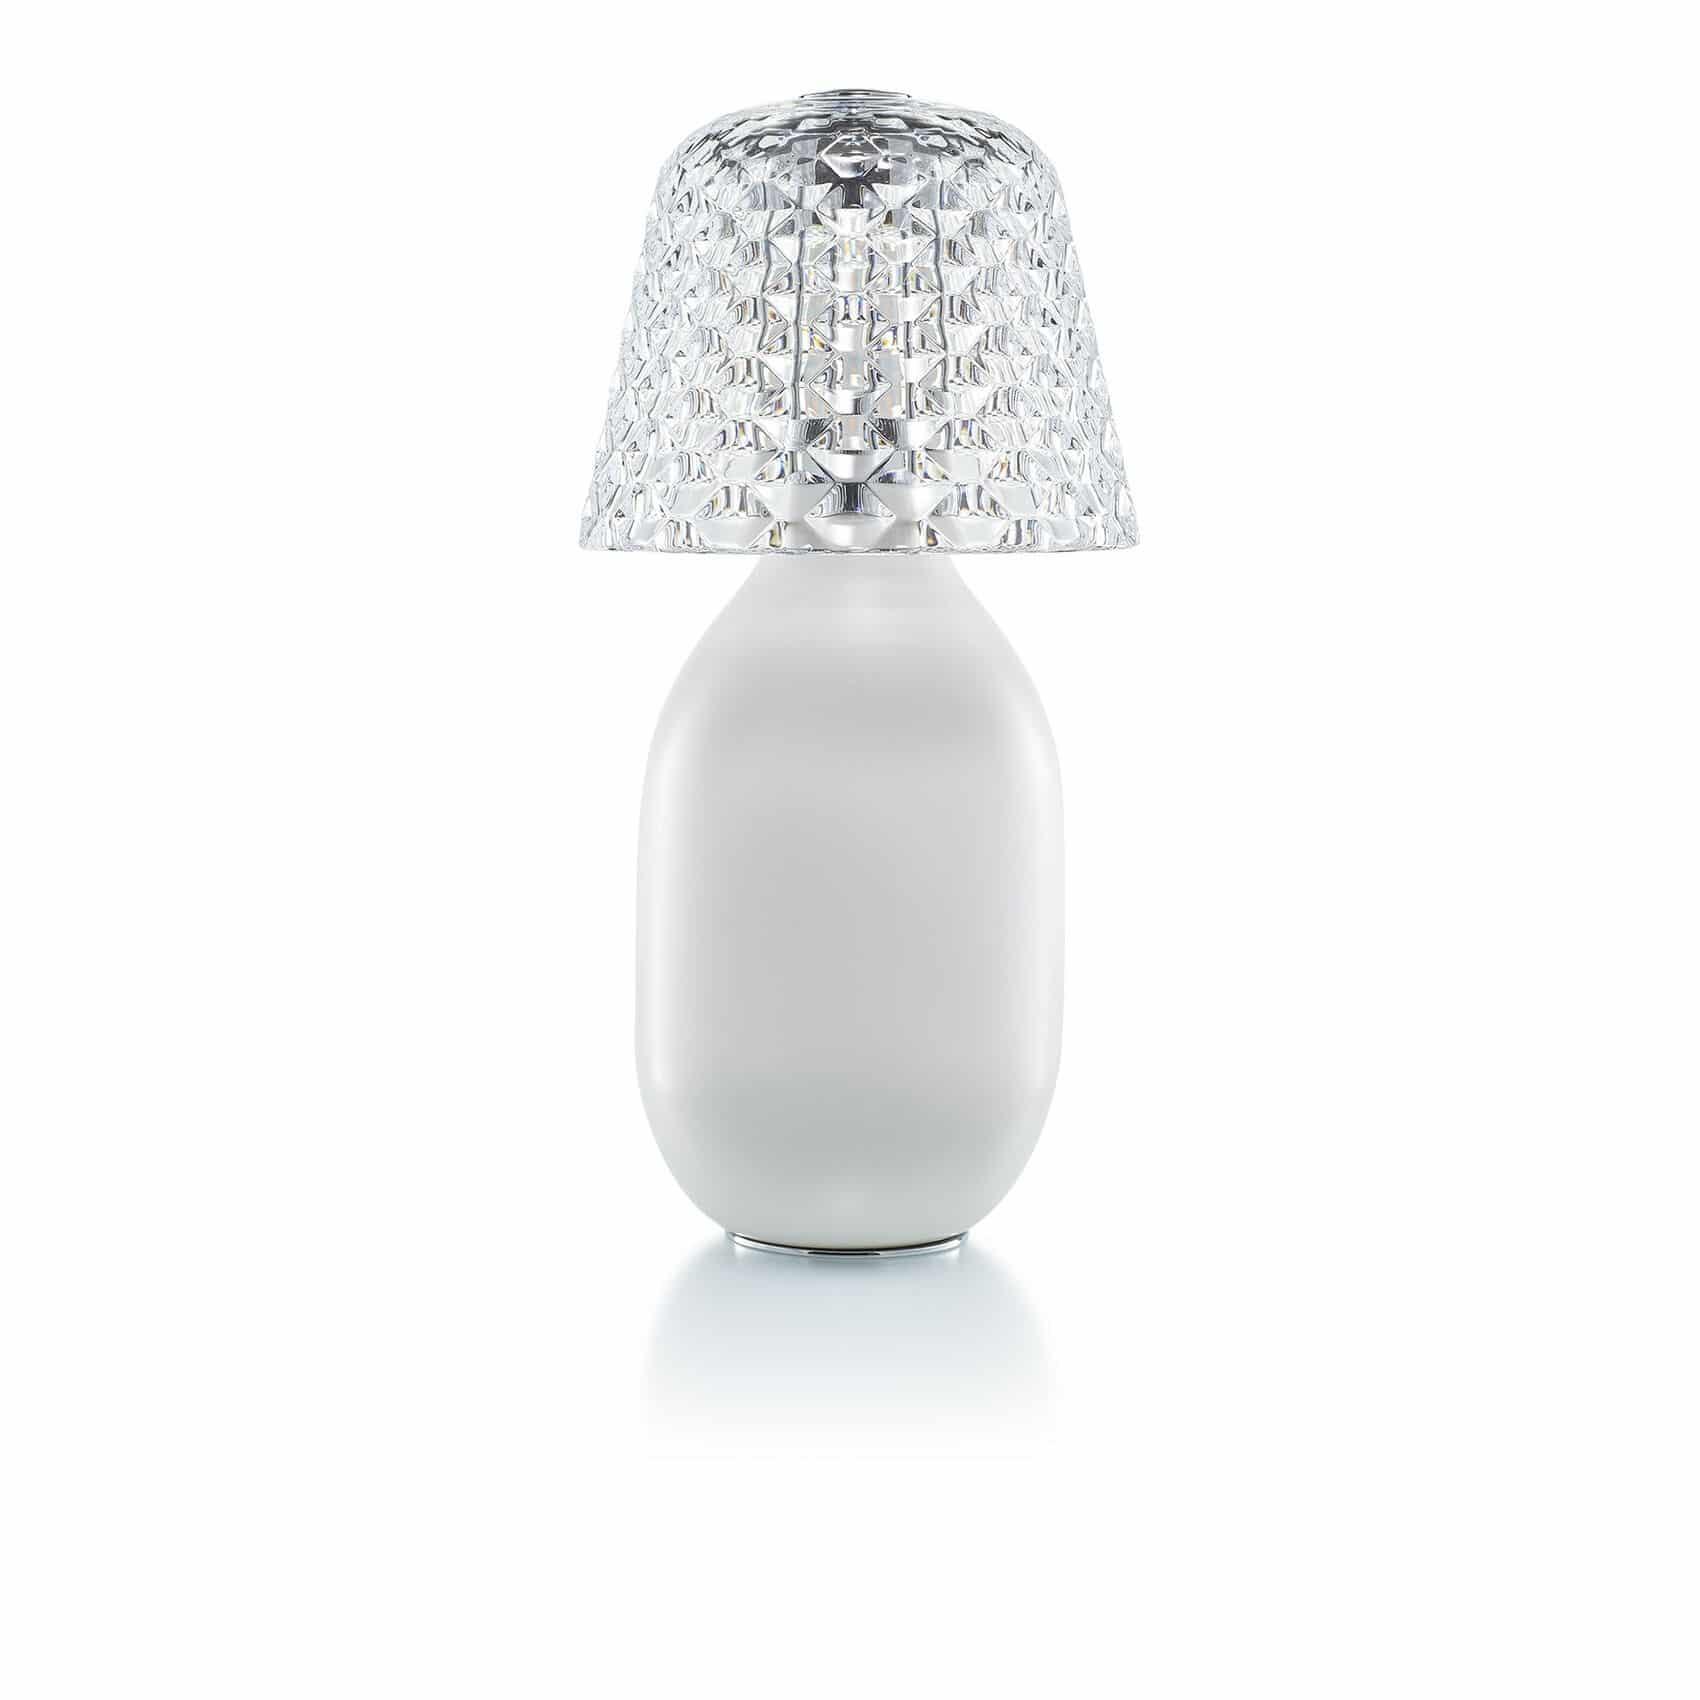 BABY CANDY LIGHT NOMADIC LAMP